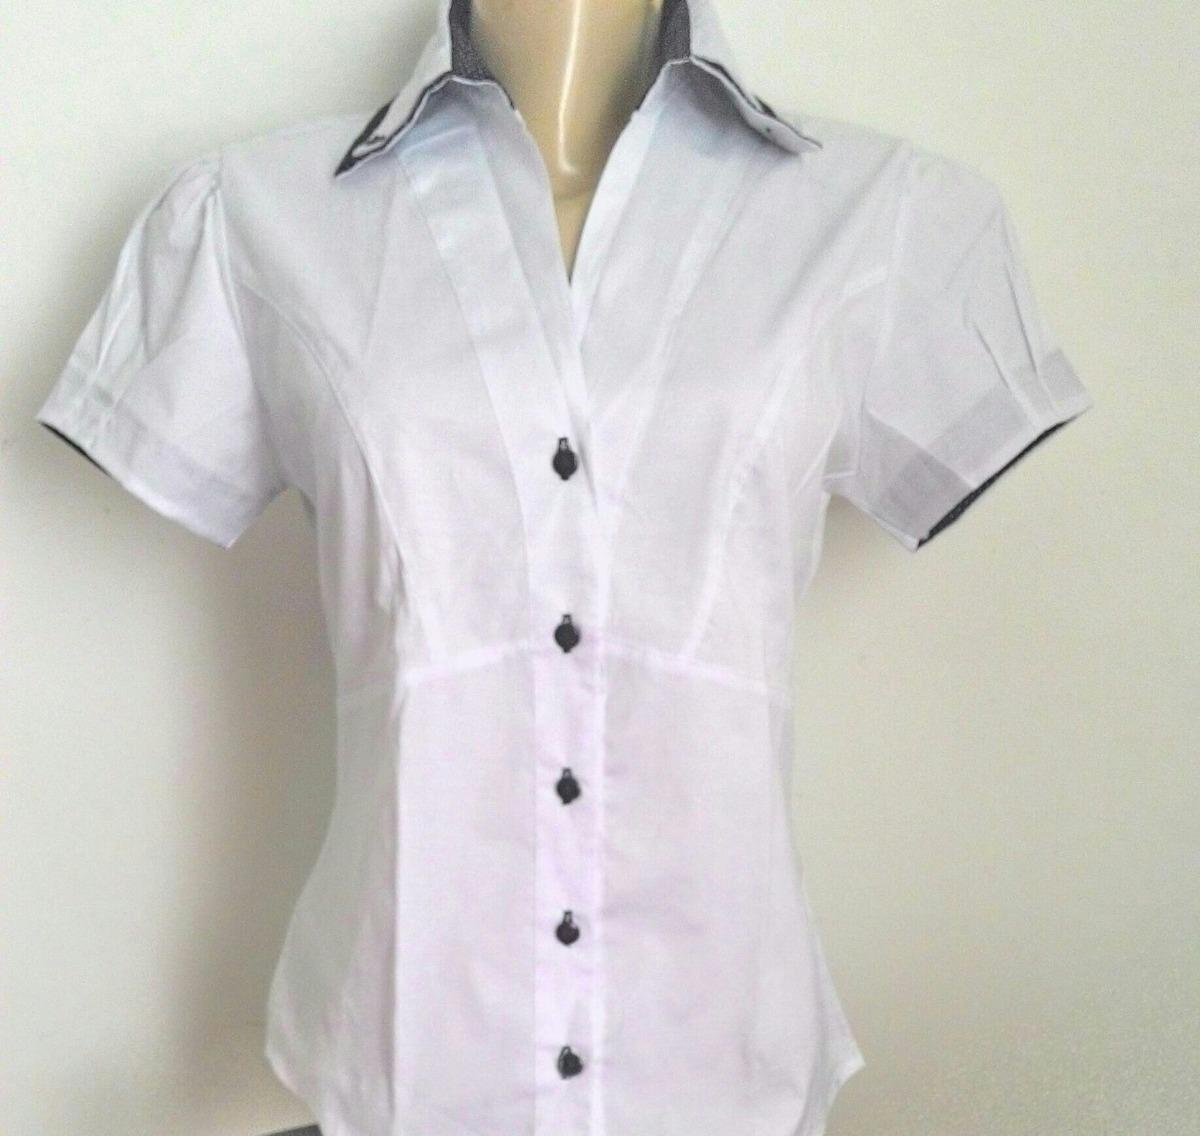 camisa social feminina branca manga curta. Carregando zoom. 4abe03bfcac28